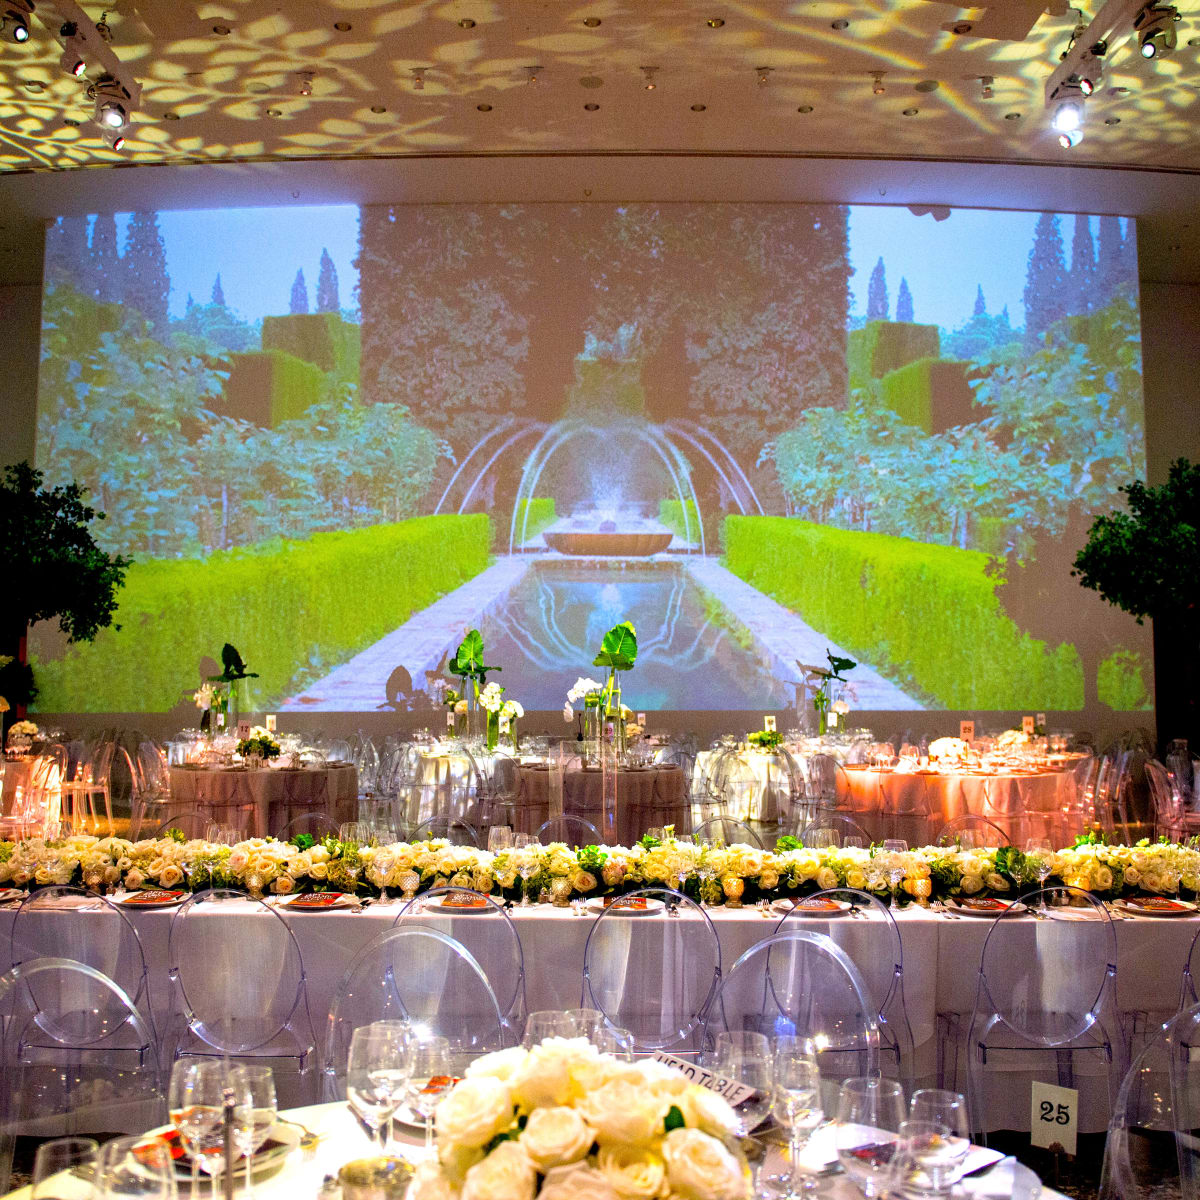 Houston, MFAH Art of the Islamic Worlds Gala, November 2017, atmosphere